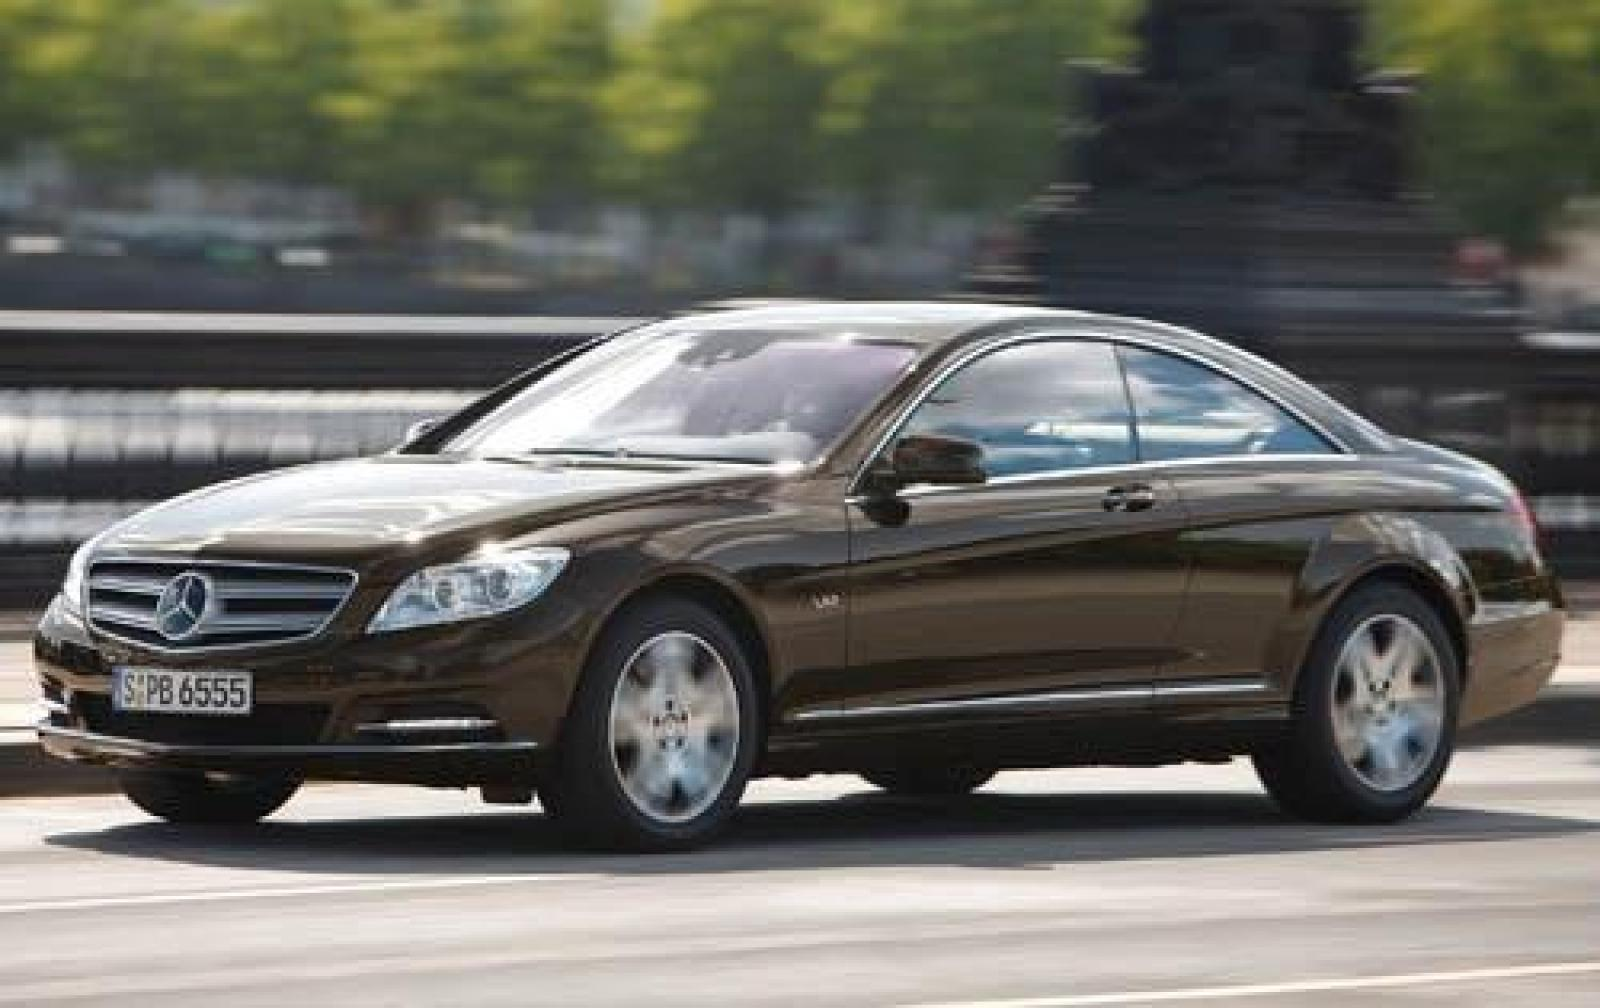 2011 mercedes benz cl class information and photos for Mercedes benz cl class